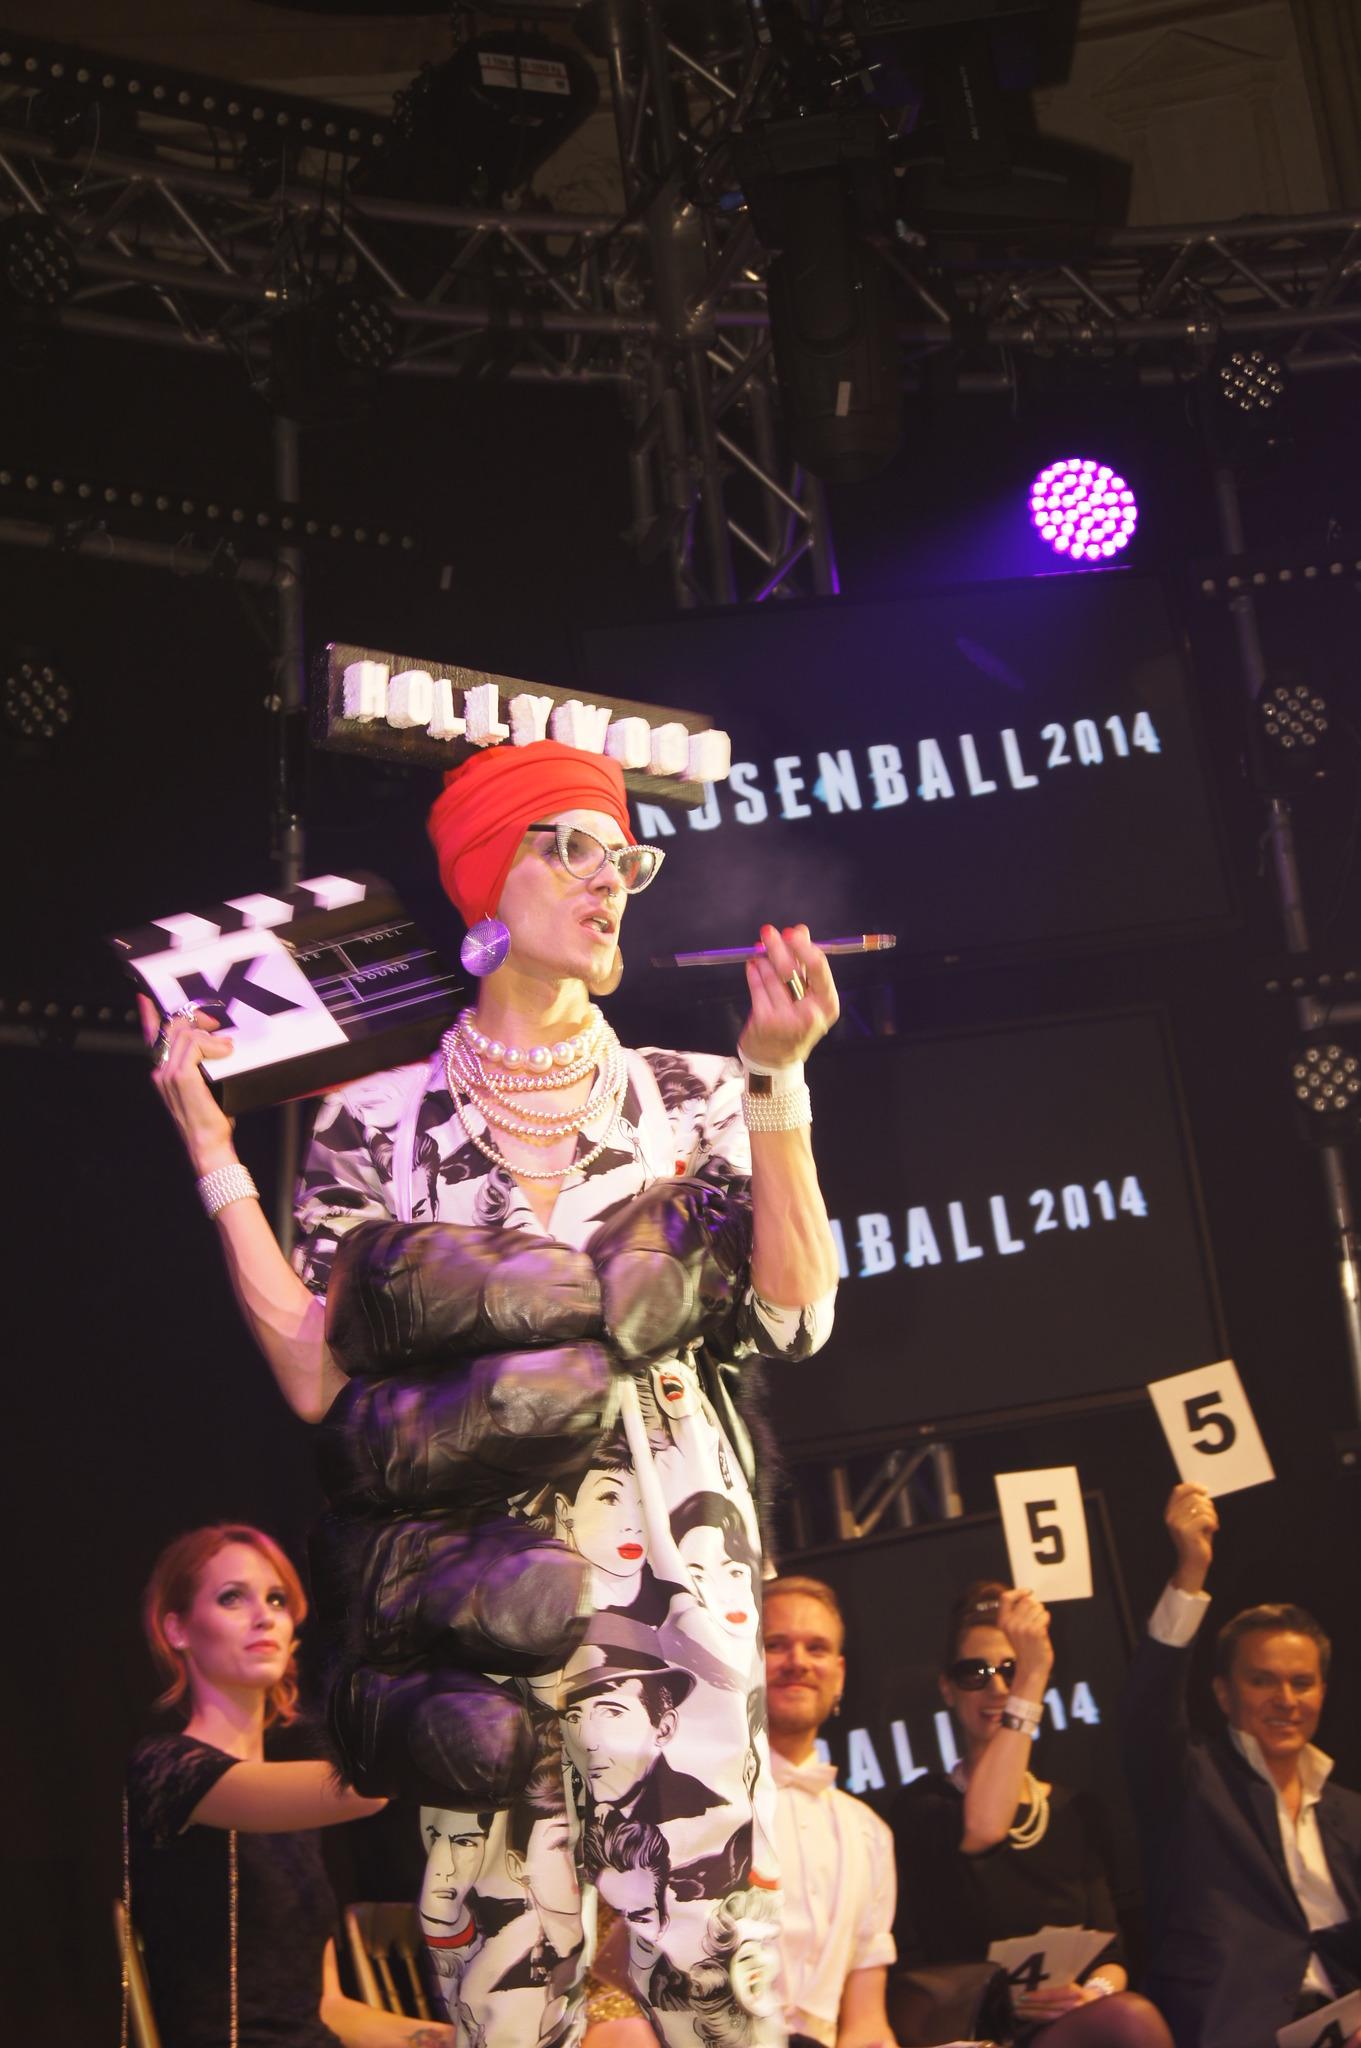 Schrille Ballnacht im Palais Auersperg beim Rosenball 2014 Josefstadt